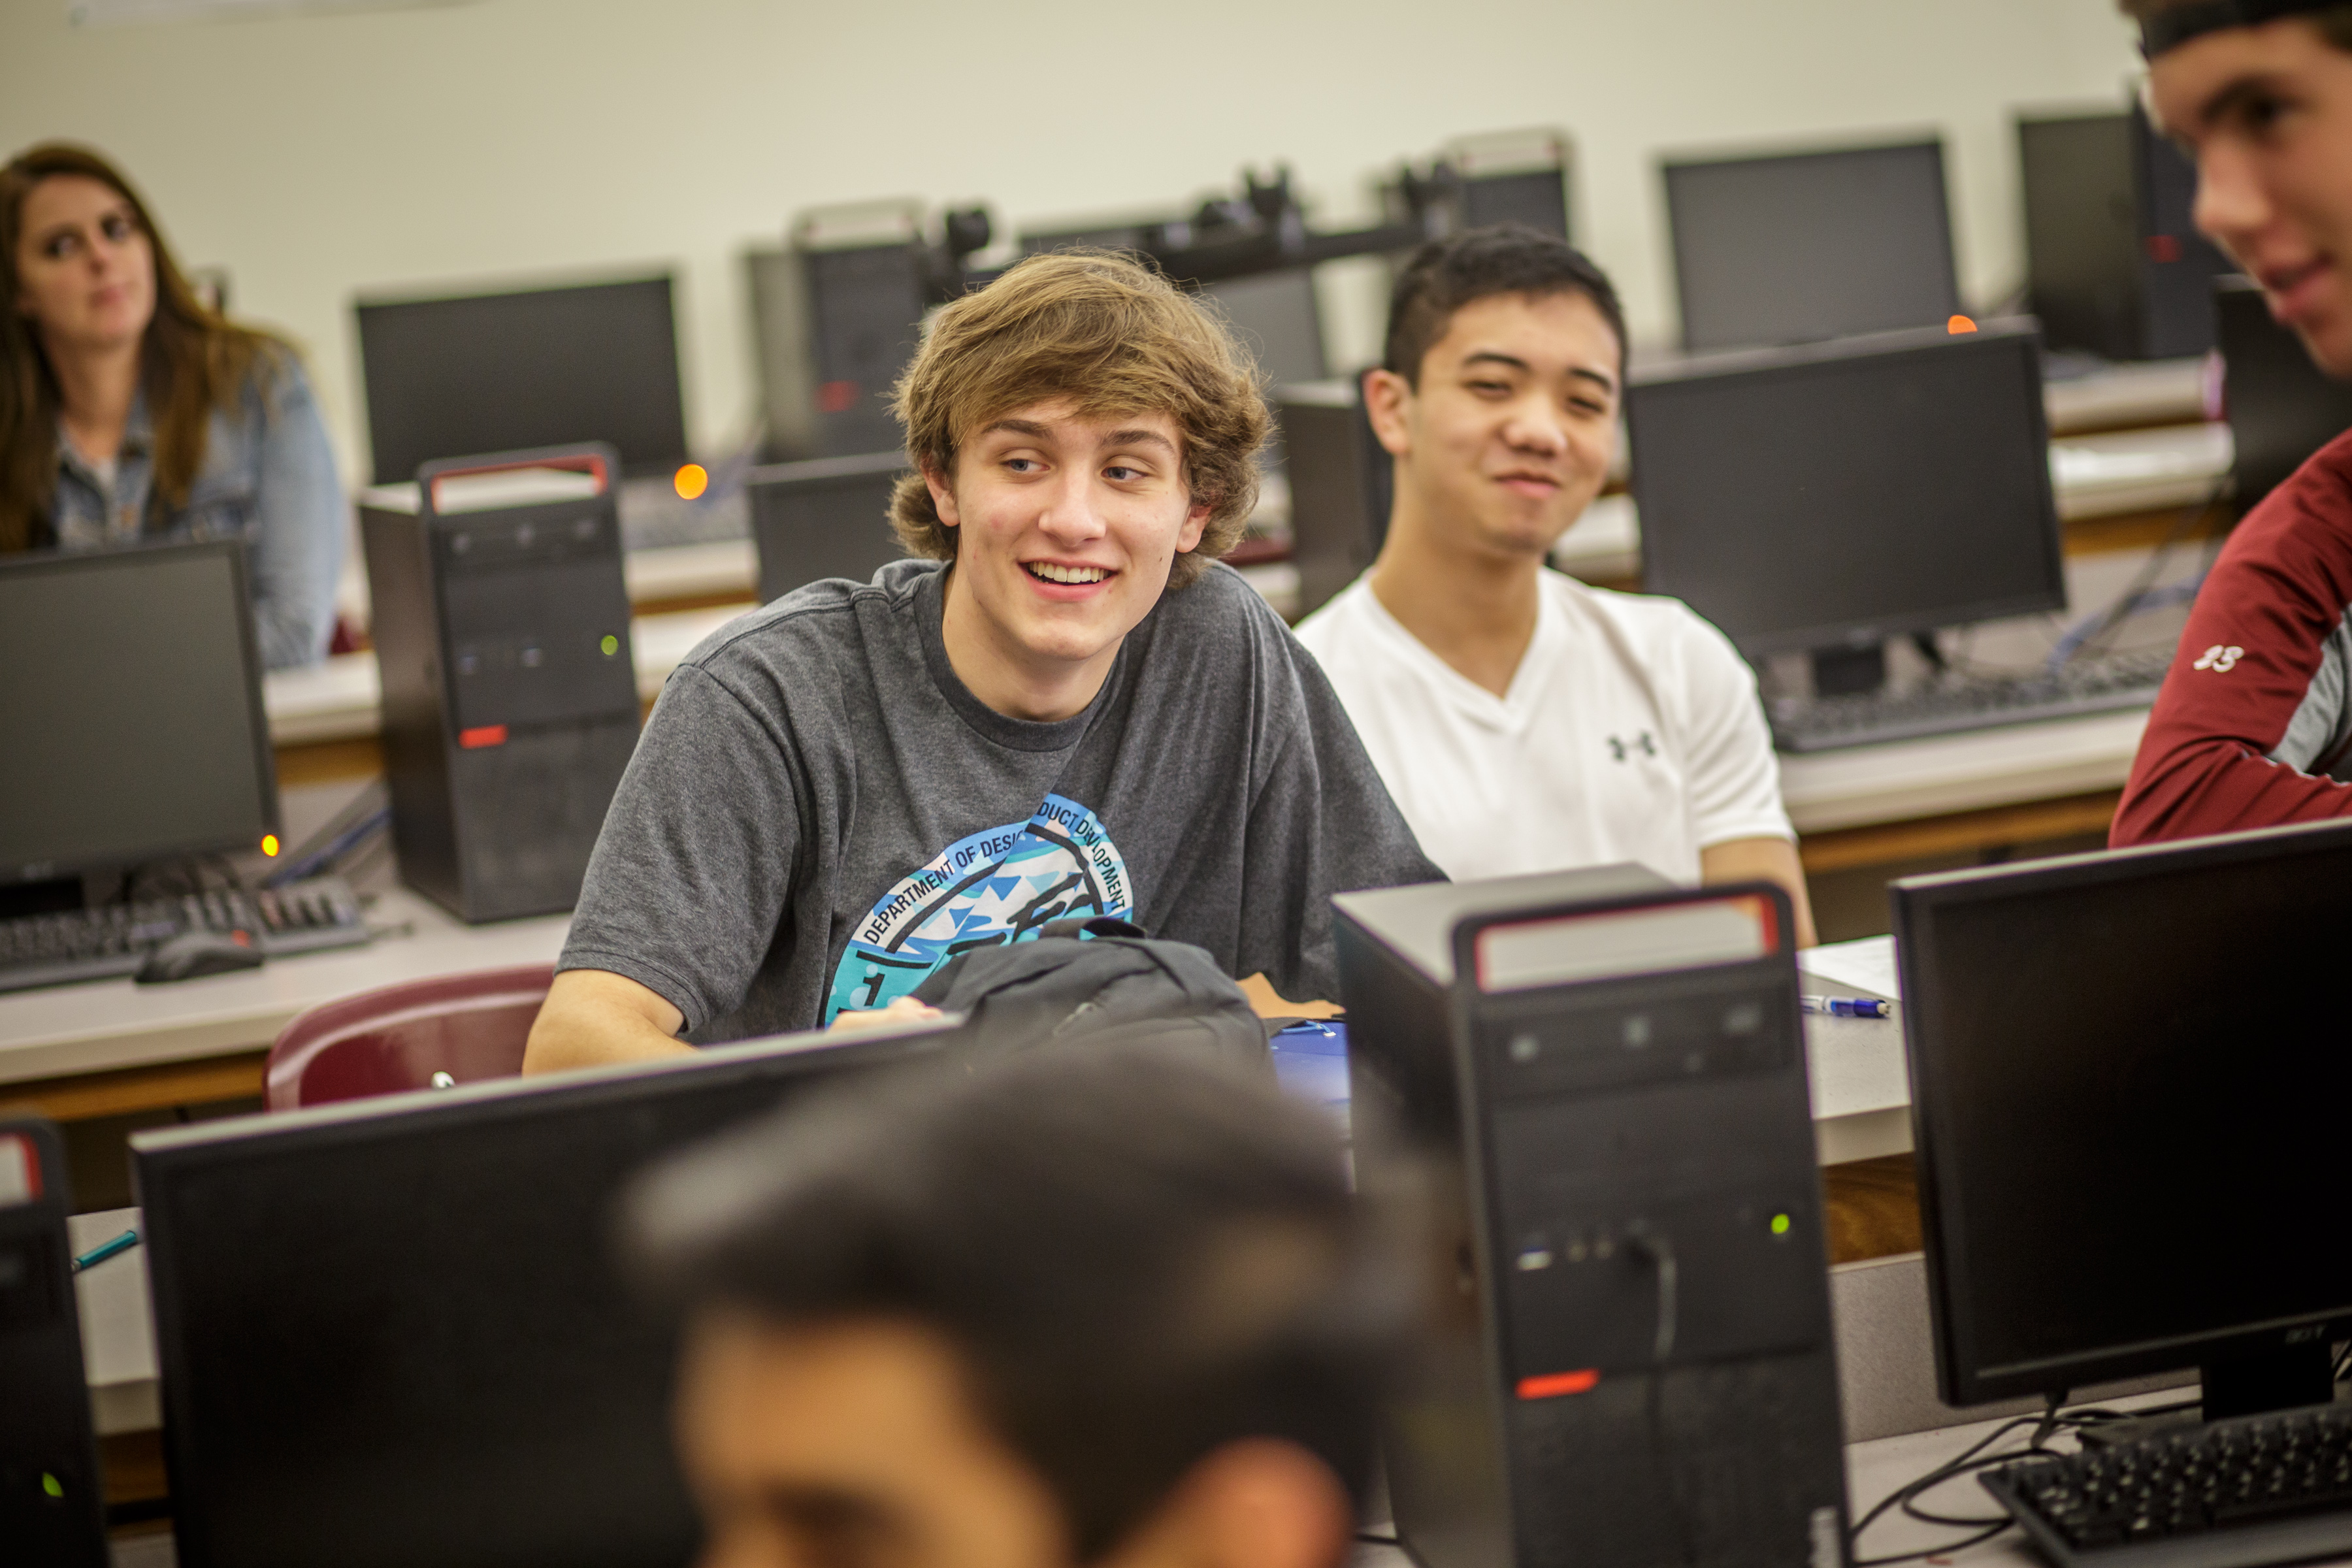 Students at a desk.